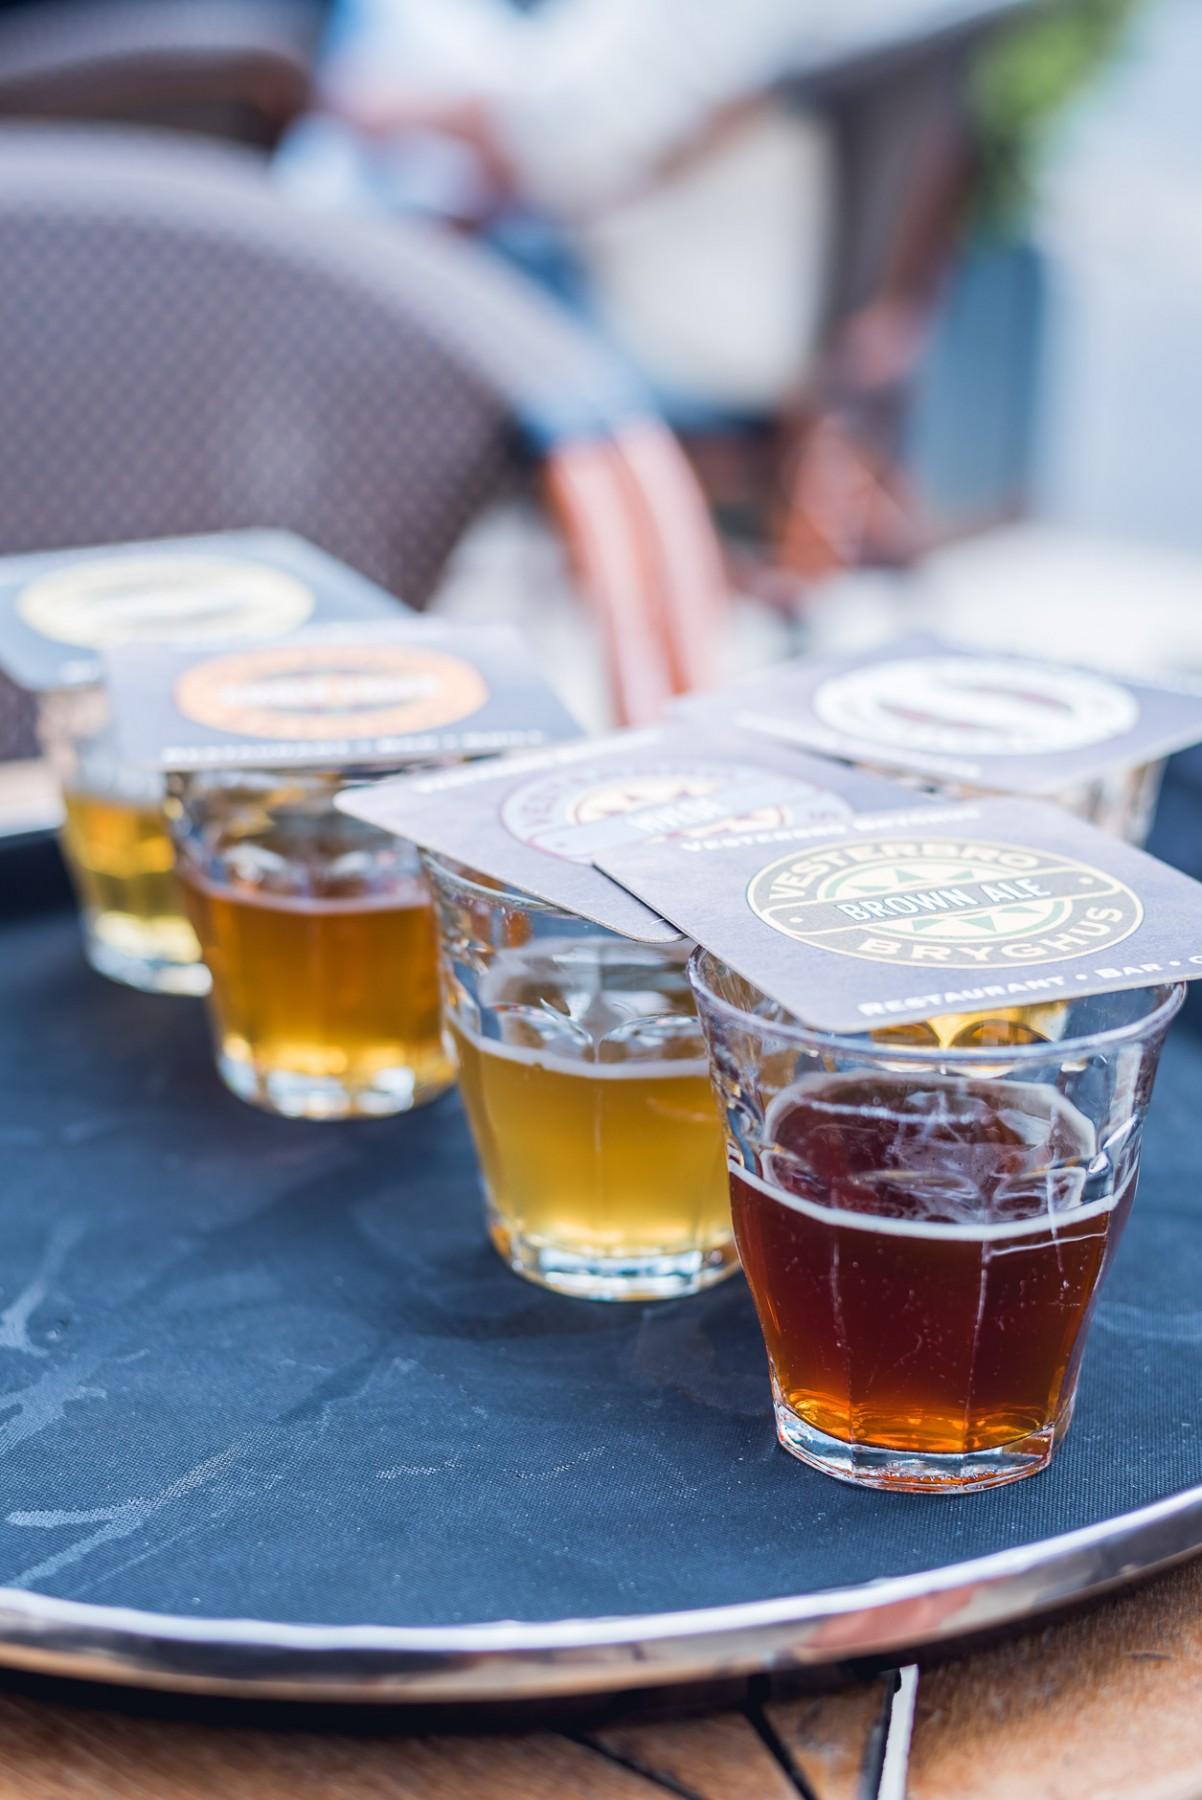 Beer tasting in Copenhagen, Denmark